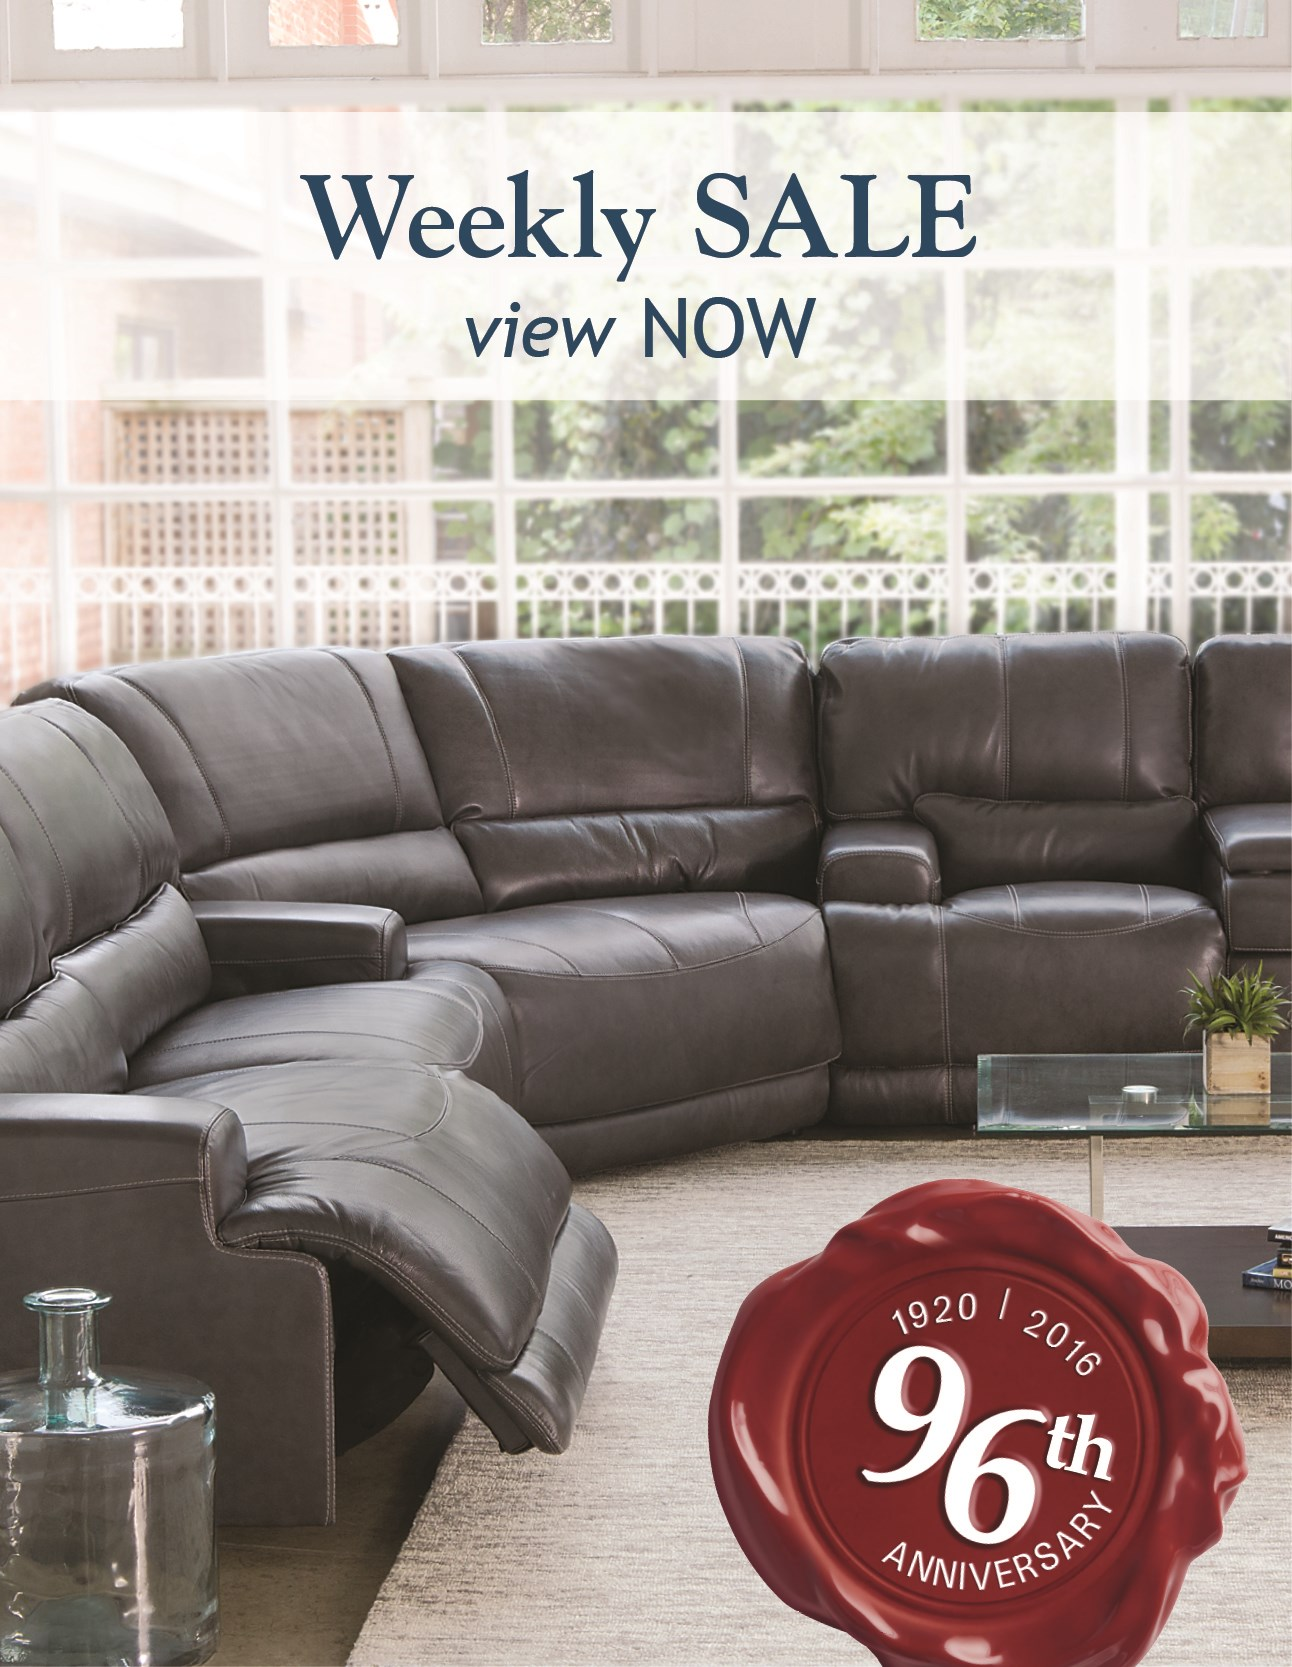 broyhill sofa nebraska furniture mart cheap bean bag sofas uk darvin orland park chicago il